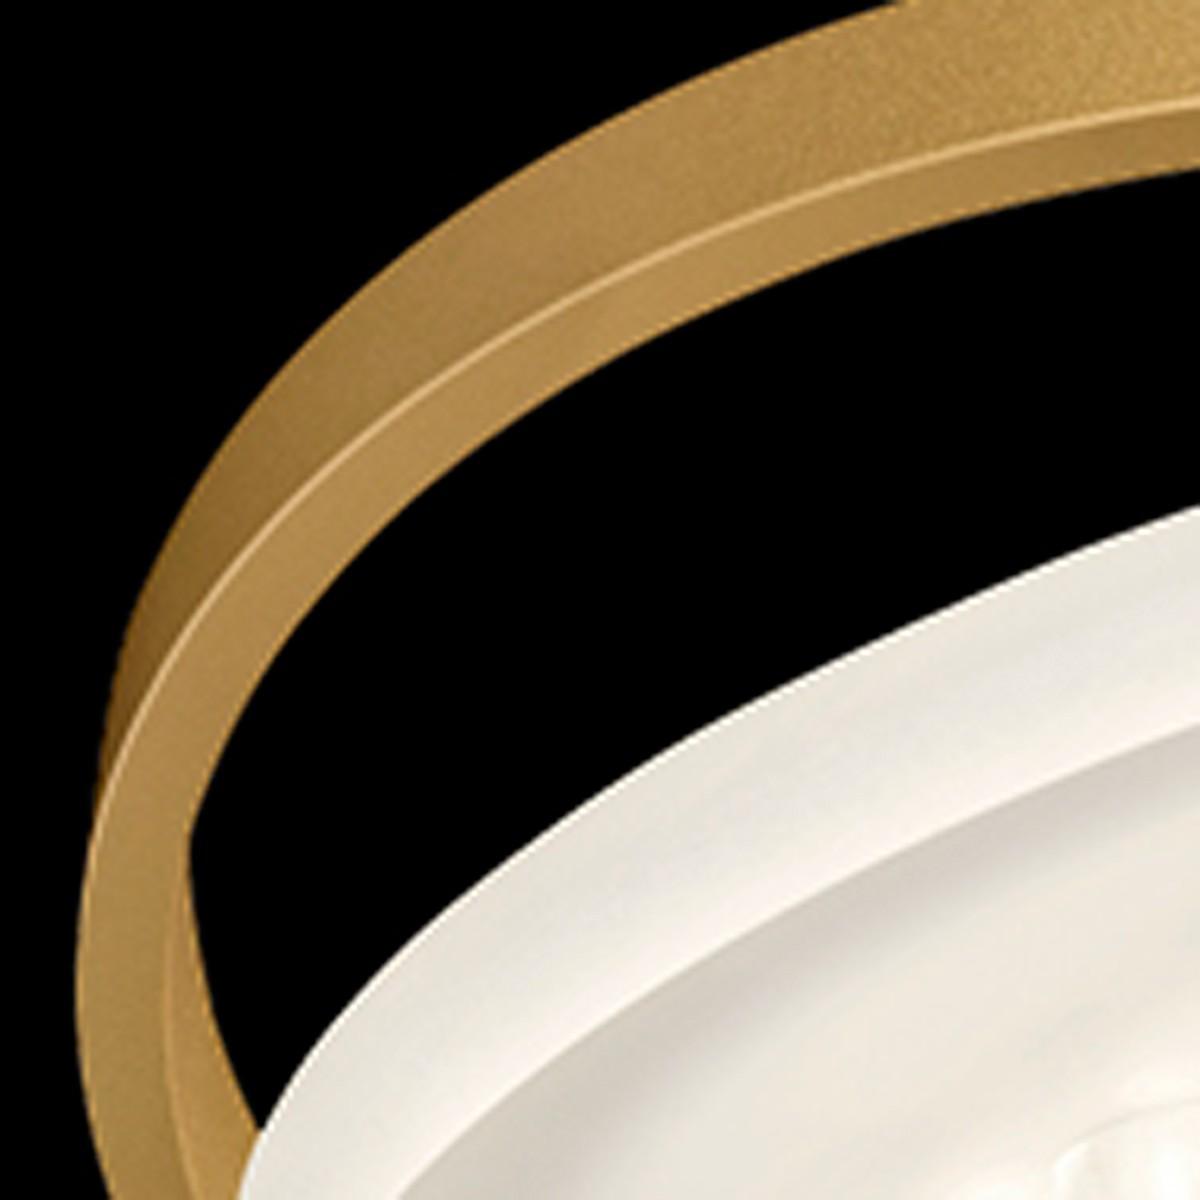 Nimbus Rim R 49 Deckenleuchte, 3000 K, Gold matt eloxiert